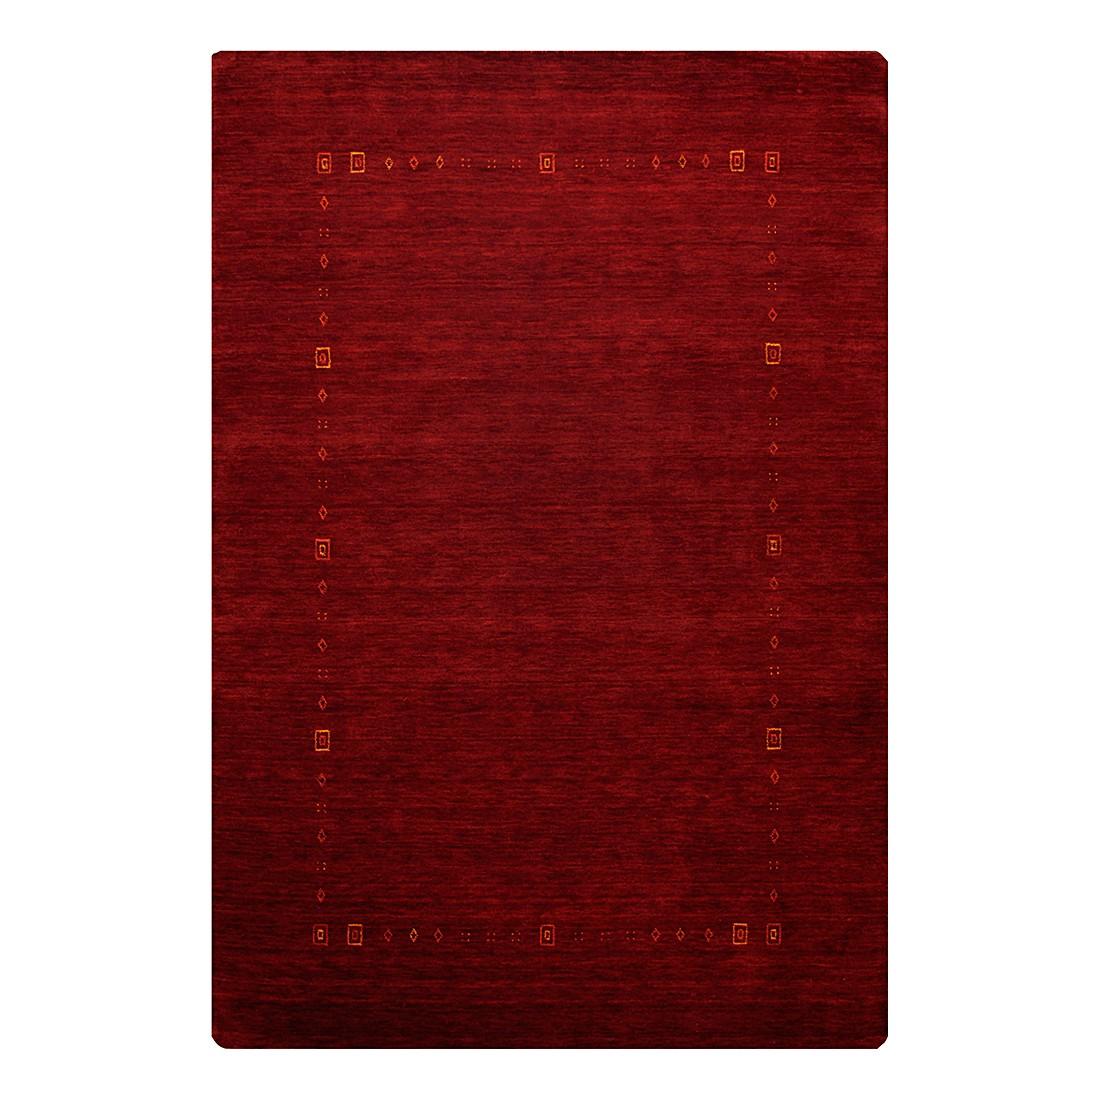 Teppich Lori Dream - Wolle/Rot - 250 cm x 350 cm, Theko die markenteppiche